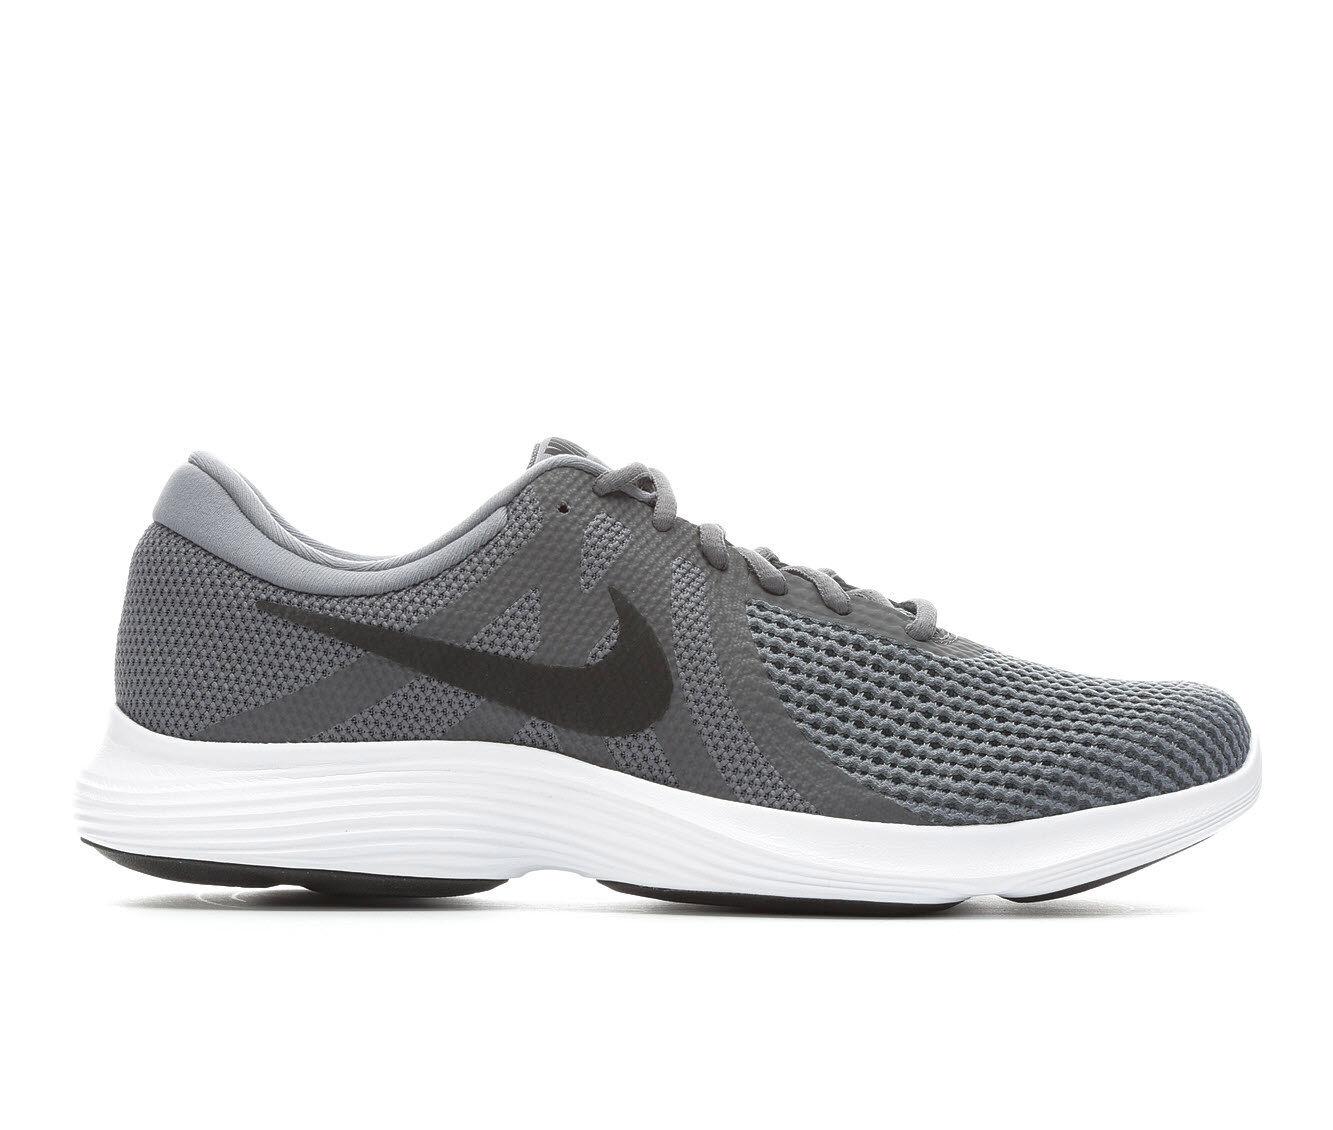 Autumn Spring Mens Shoes Nike Air Max 1 Essential Running